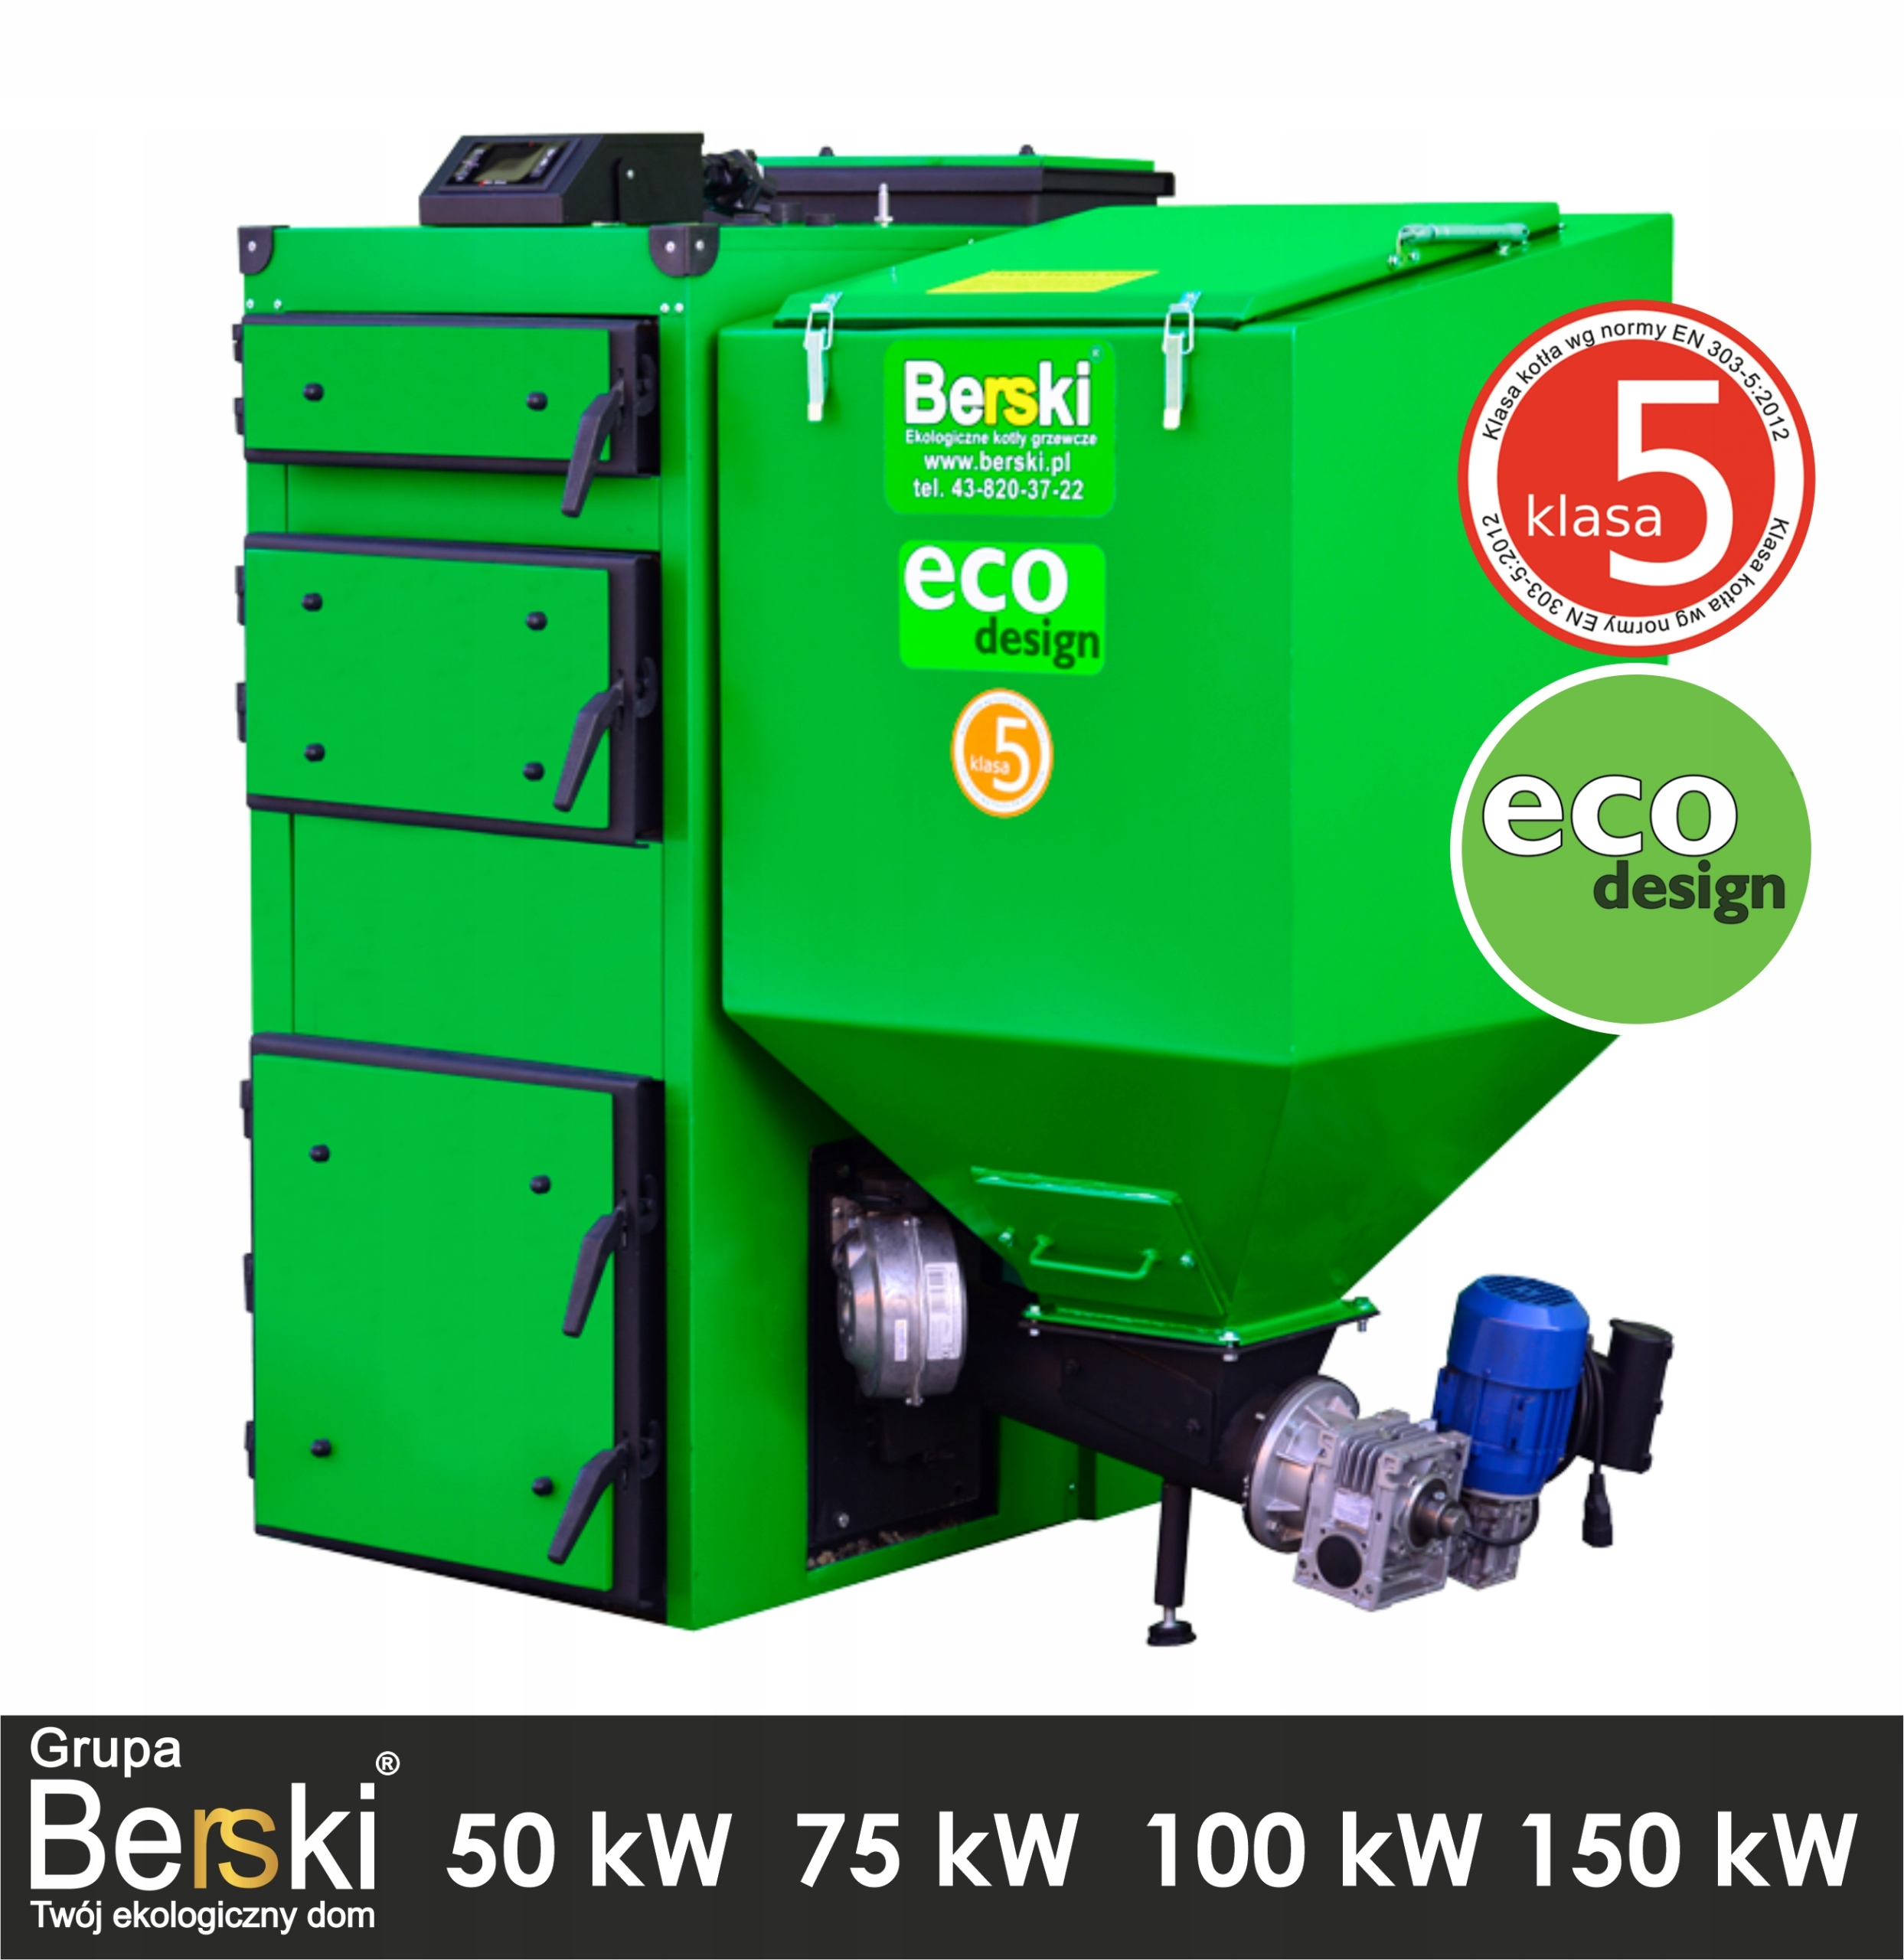 KOTLO Triedy 5 ekodesign 150 kW EKOGROSZEK